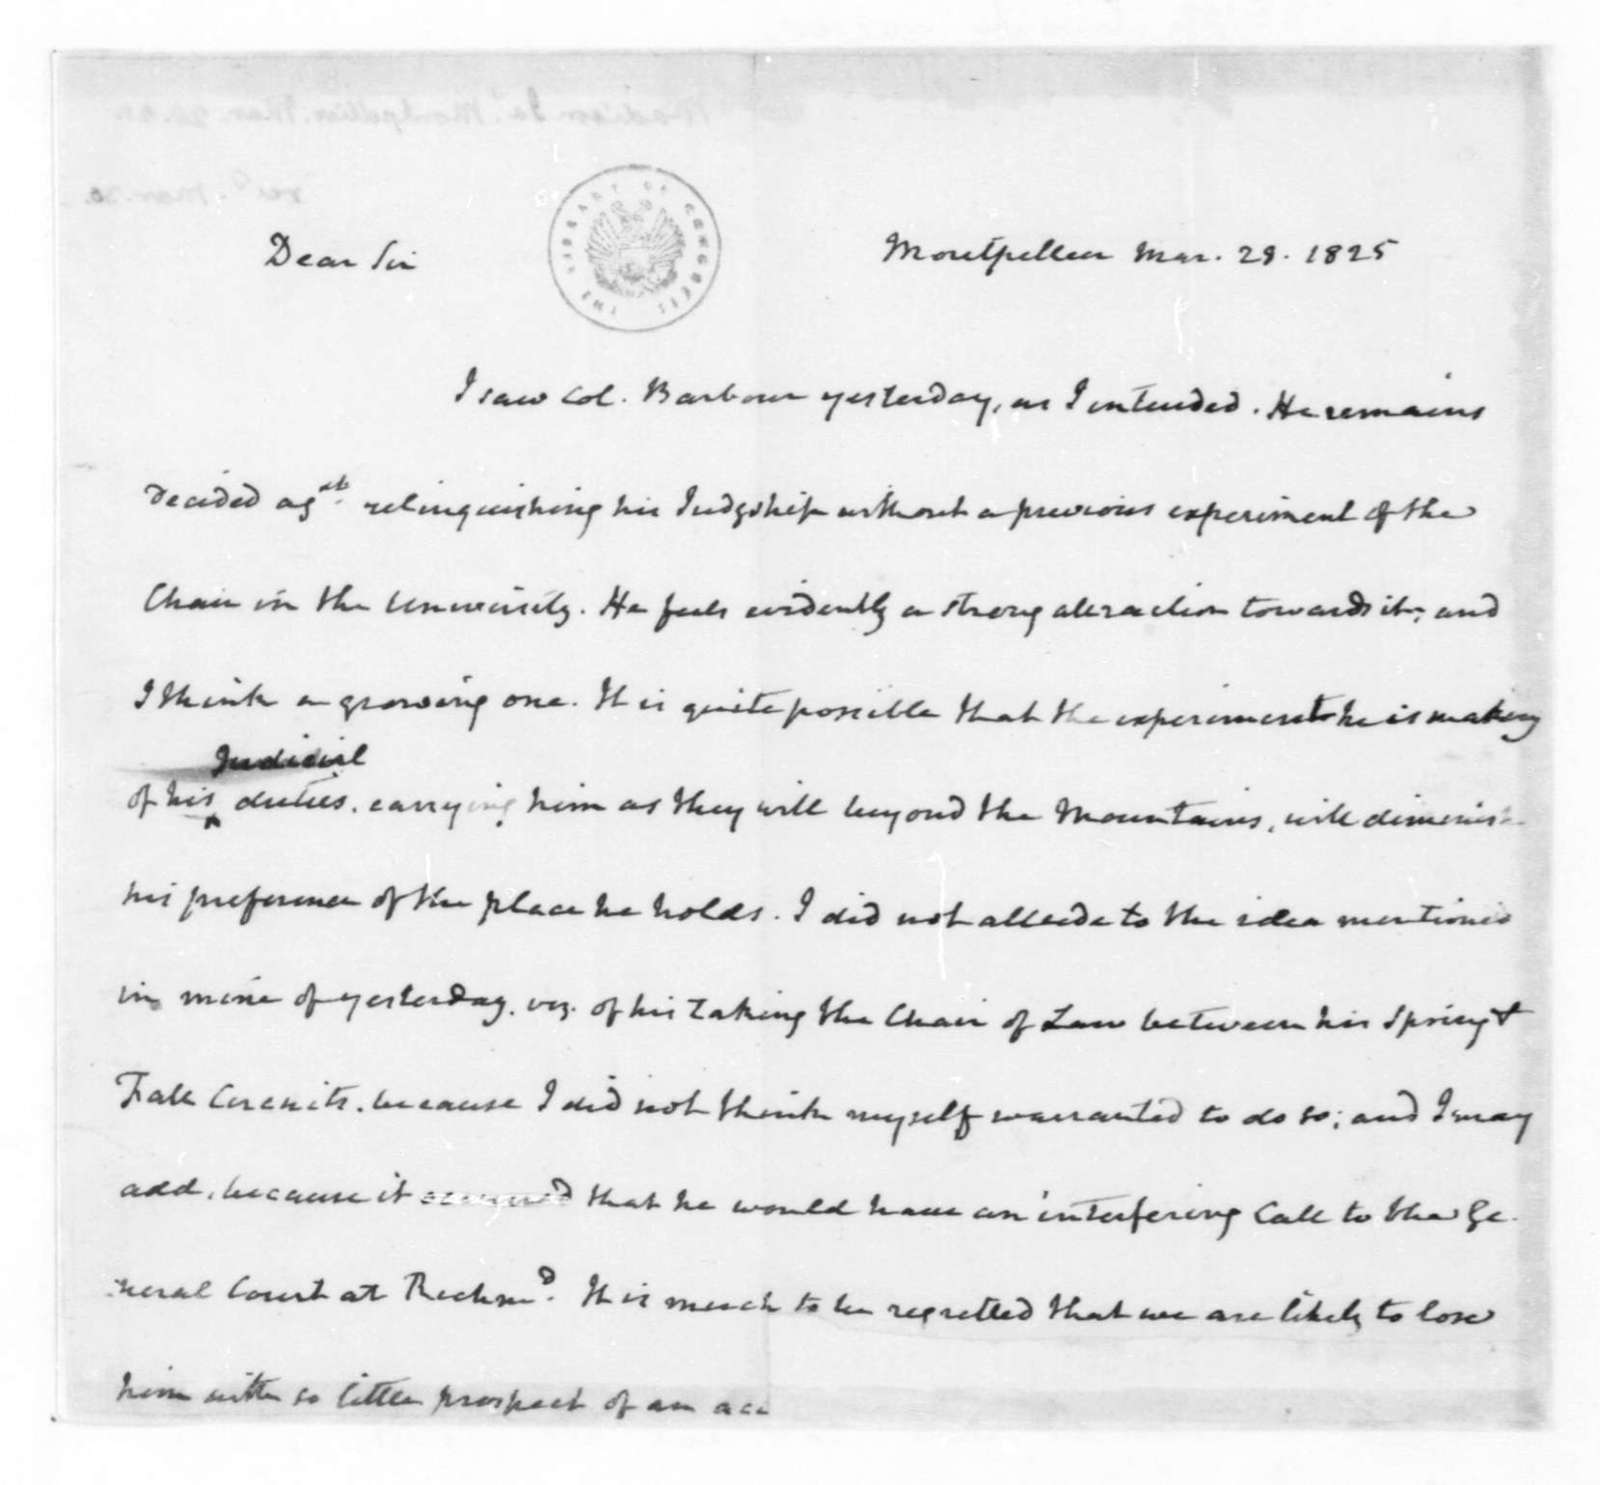 James Madison to Thomas Jefferson, March 28, 1825.